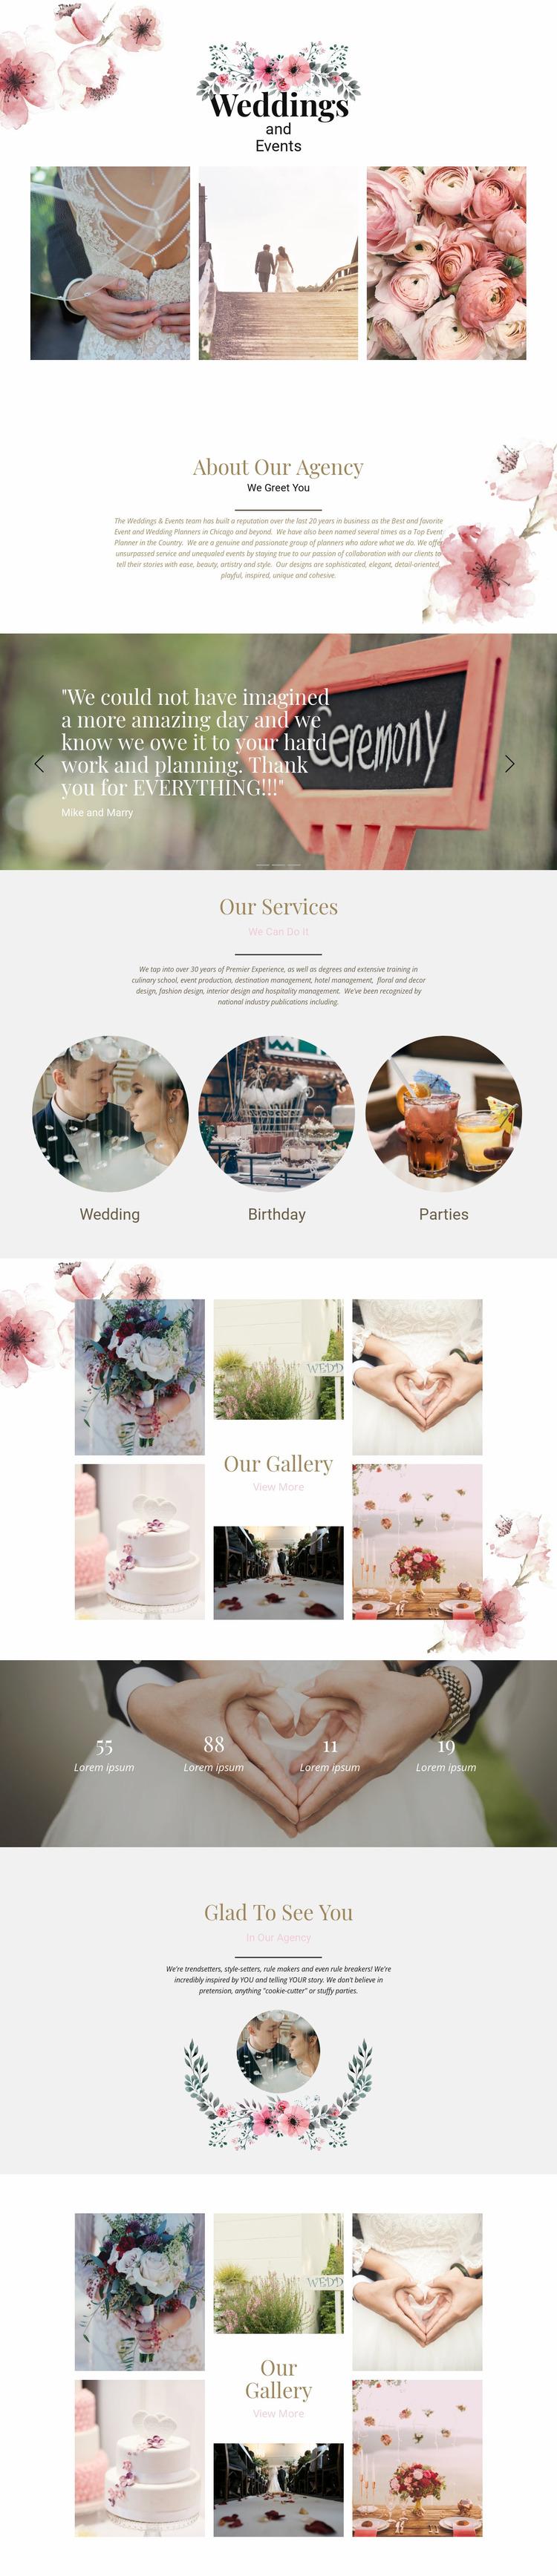 Moments of wedding Website Mockup